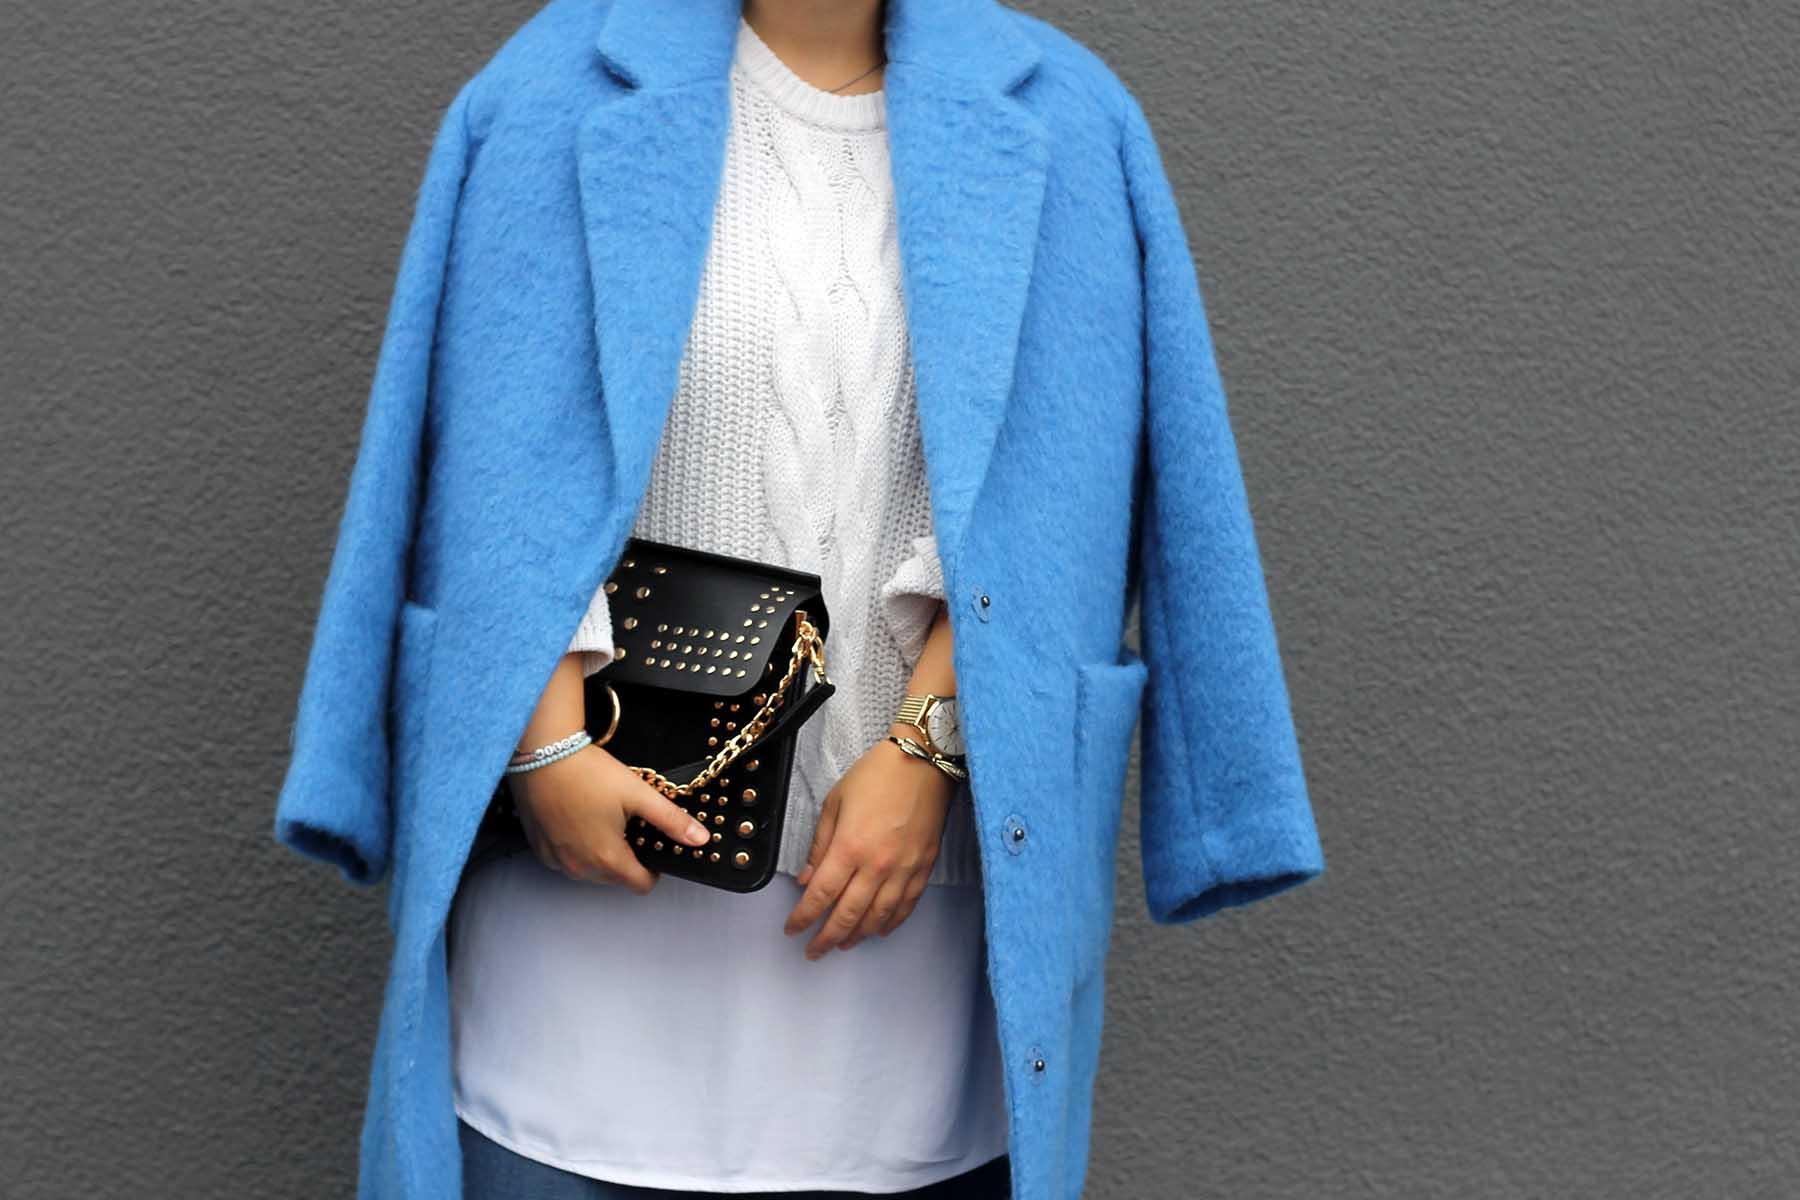 outfit-look-style-modeblog-fashionblog-blauer-mantel-jeans-balenciaga-lookalike-boots-chloe16